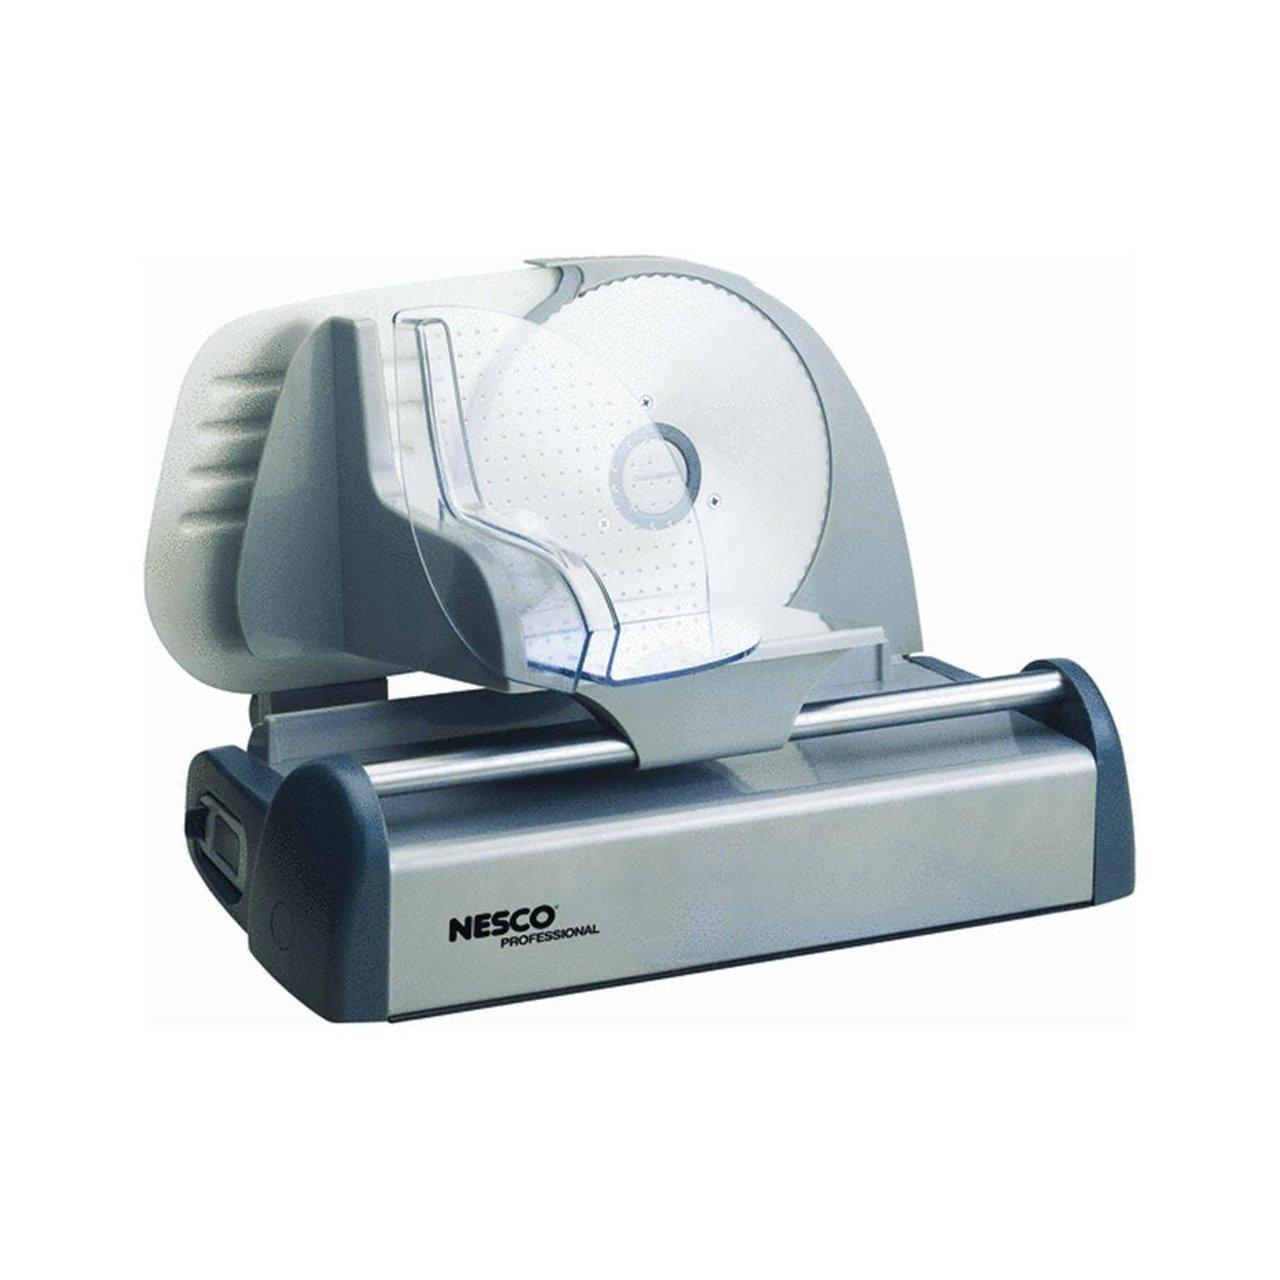 Amazon.com: Nesco Professional Food Slicer - 7 1/2in. Blade, Model ...